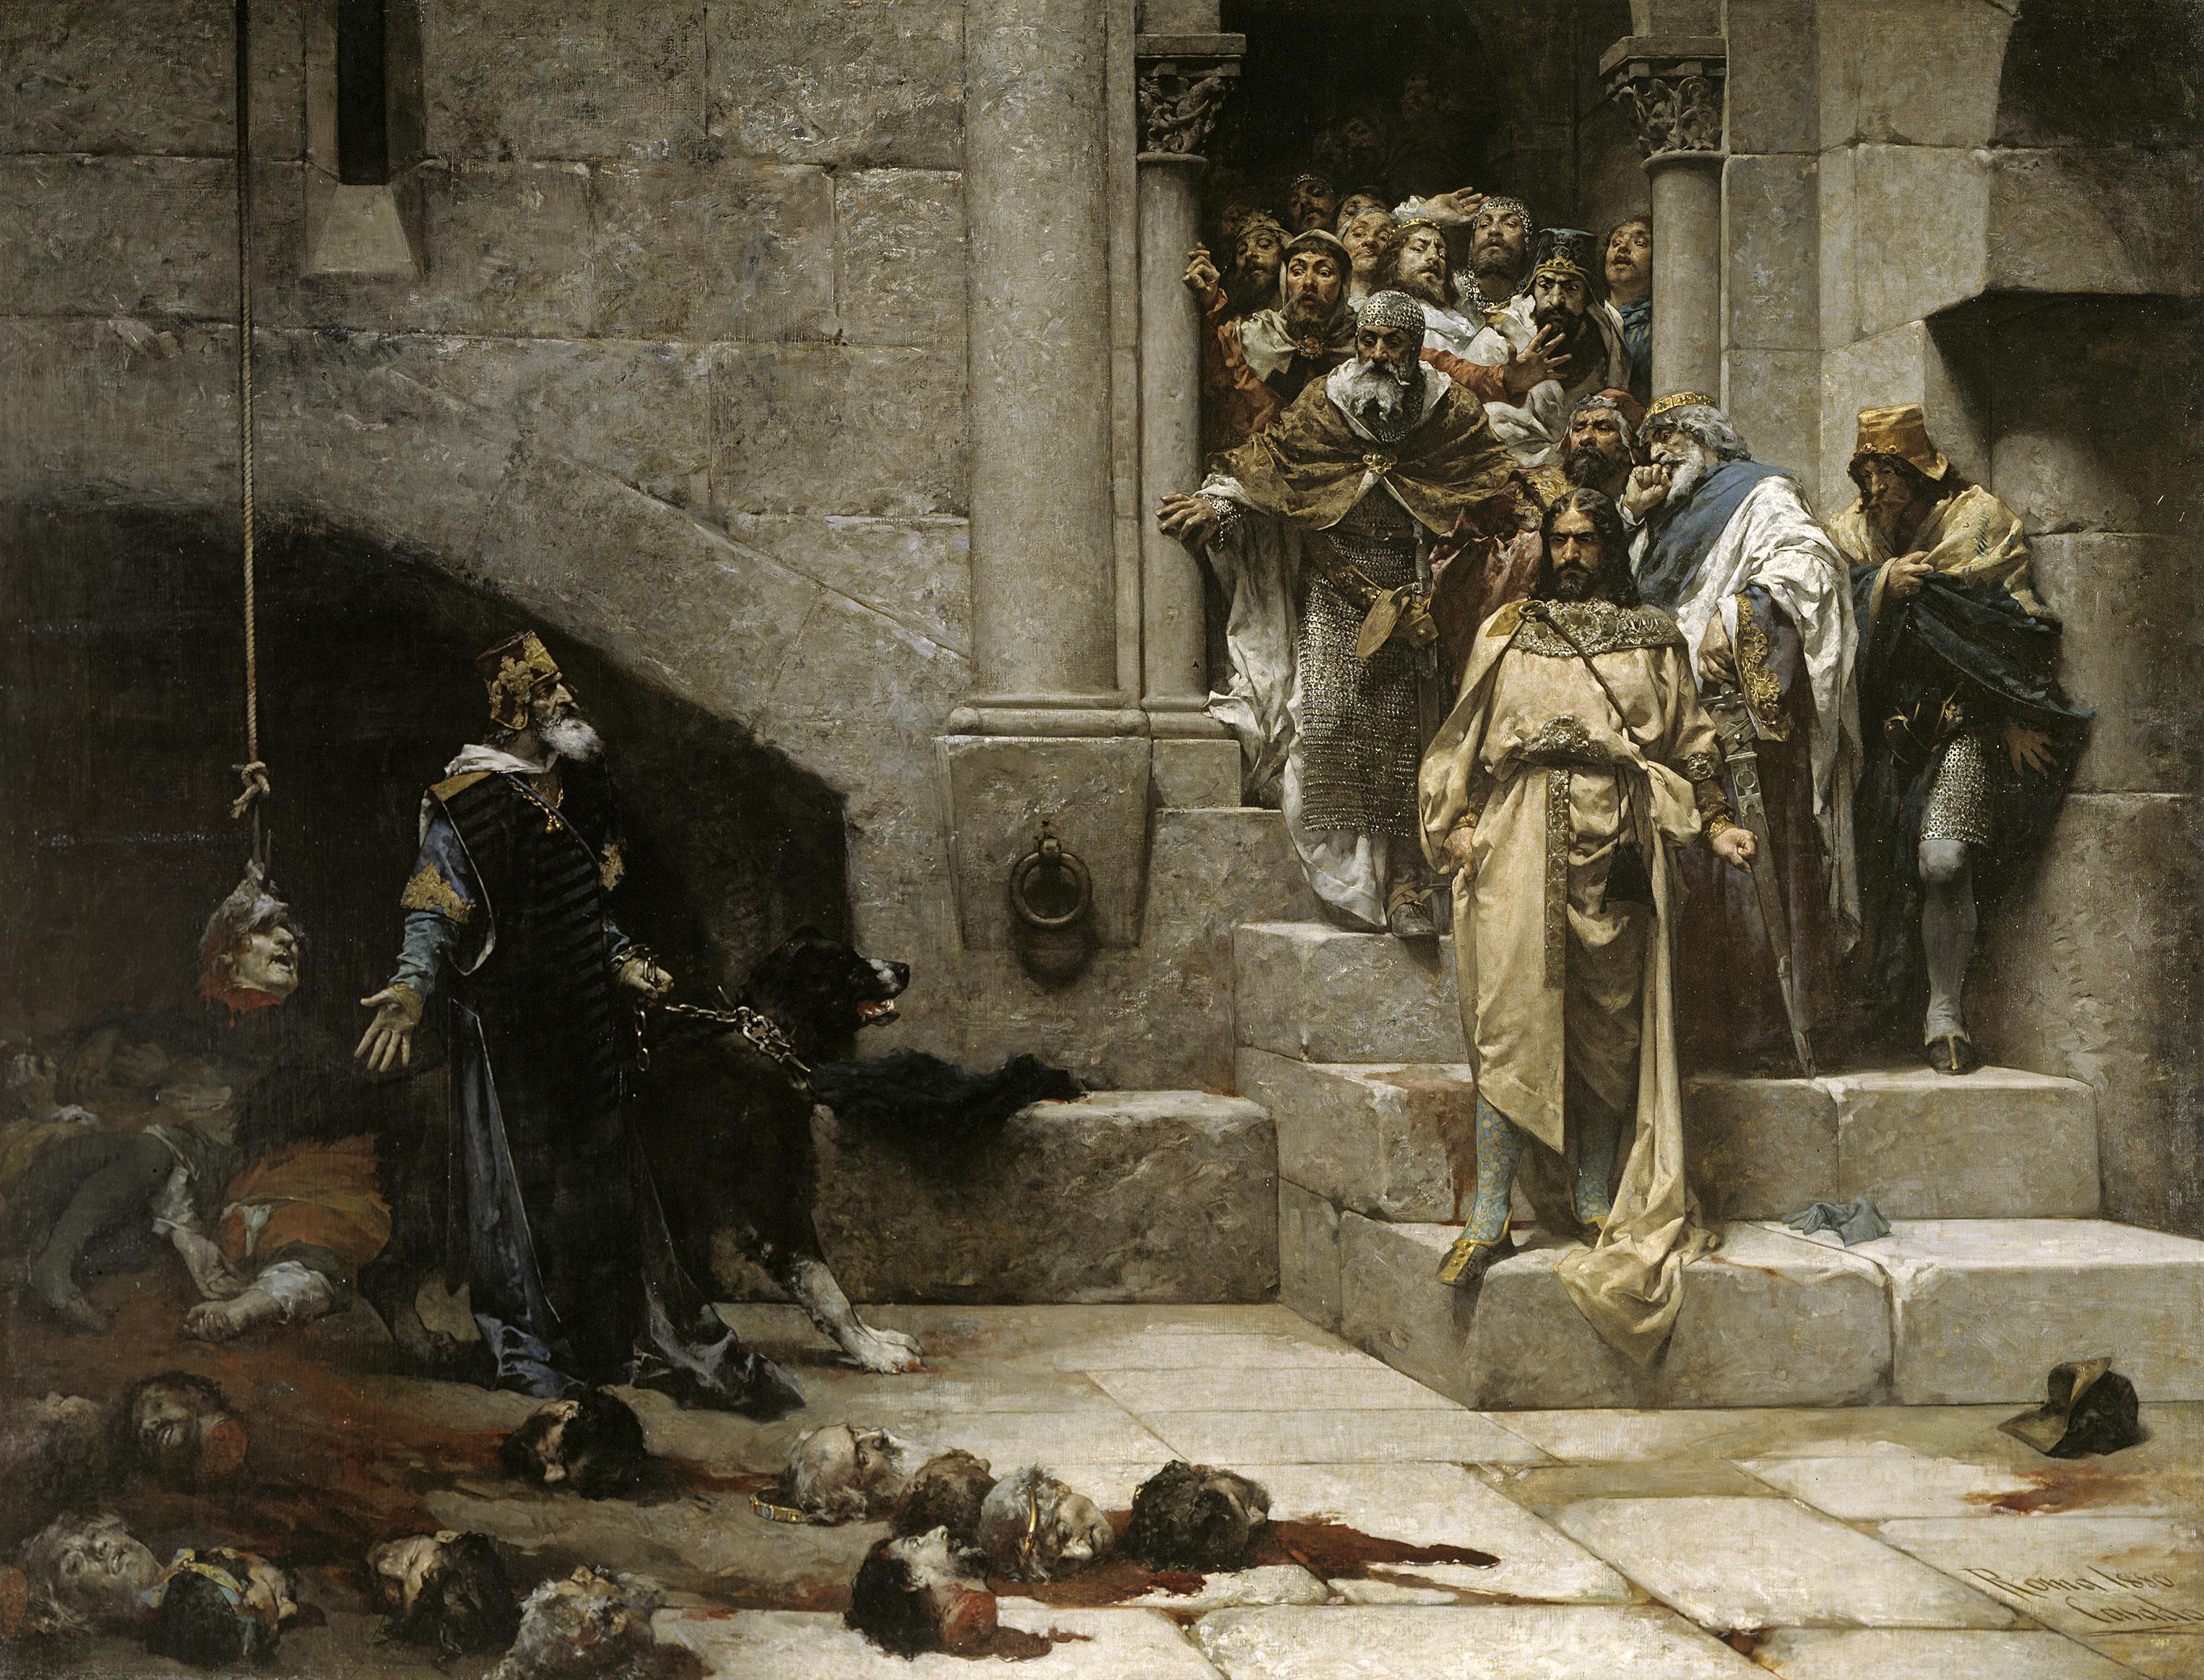 J. Casado del Alisal, La campana de Huesca